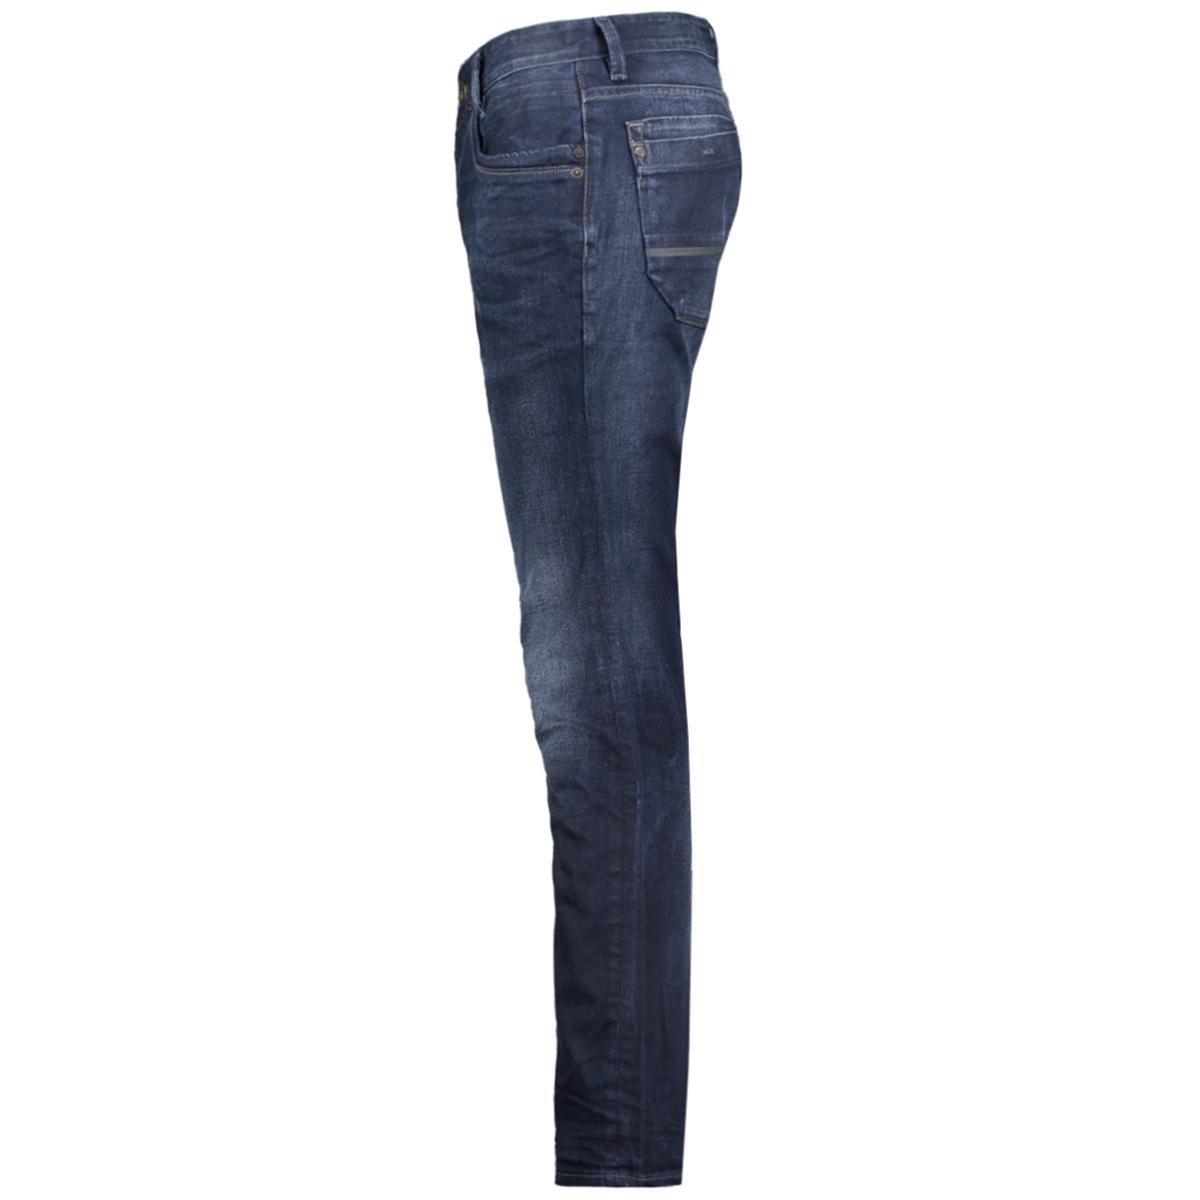 skymaster ptr650 pme legend jeans dbu